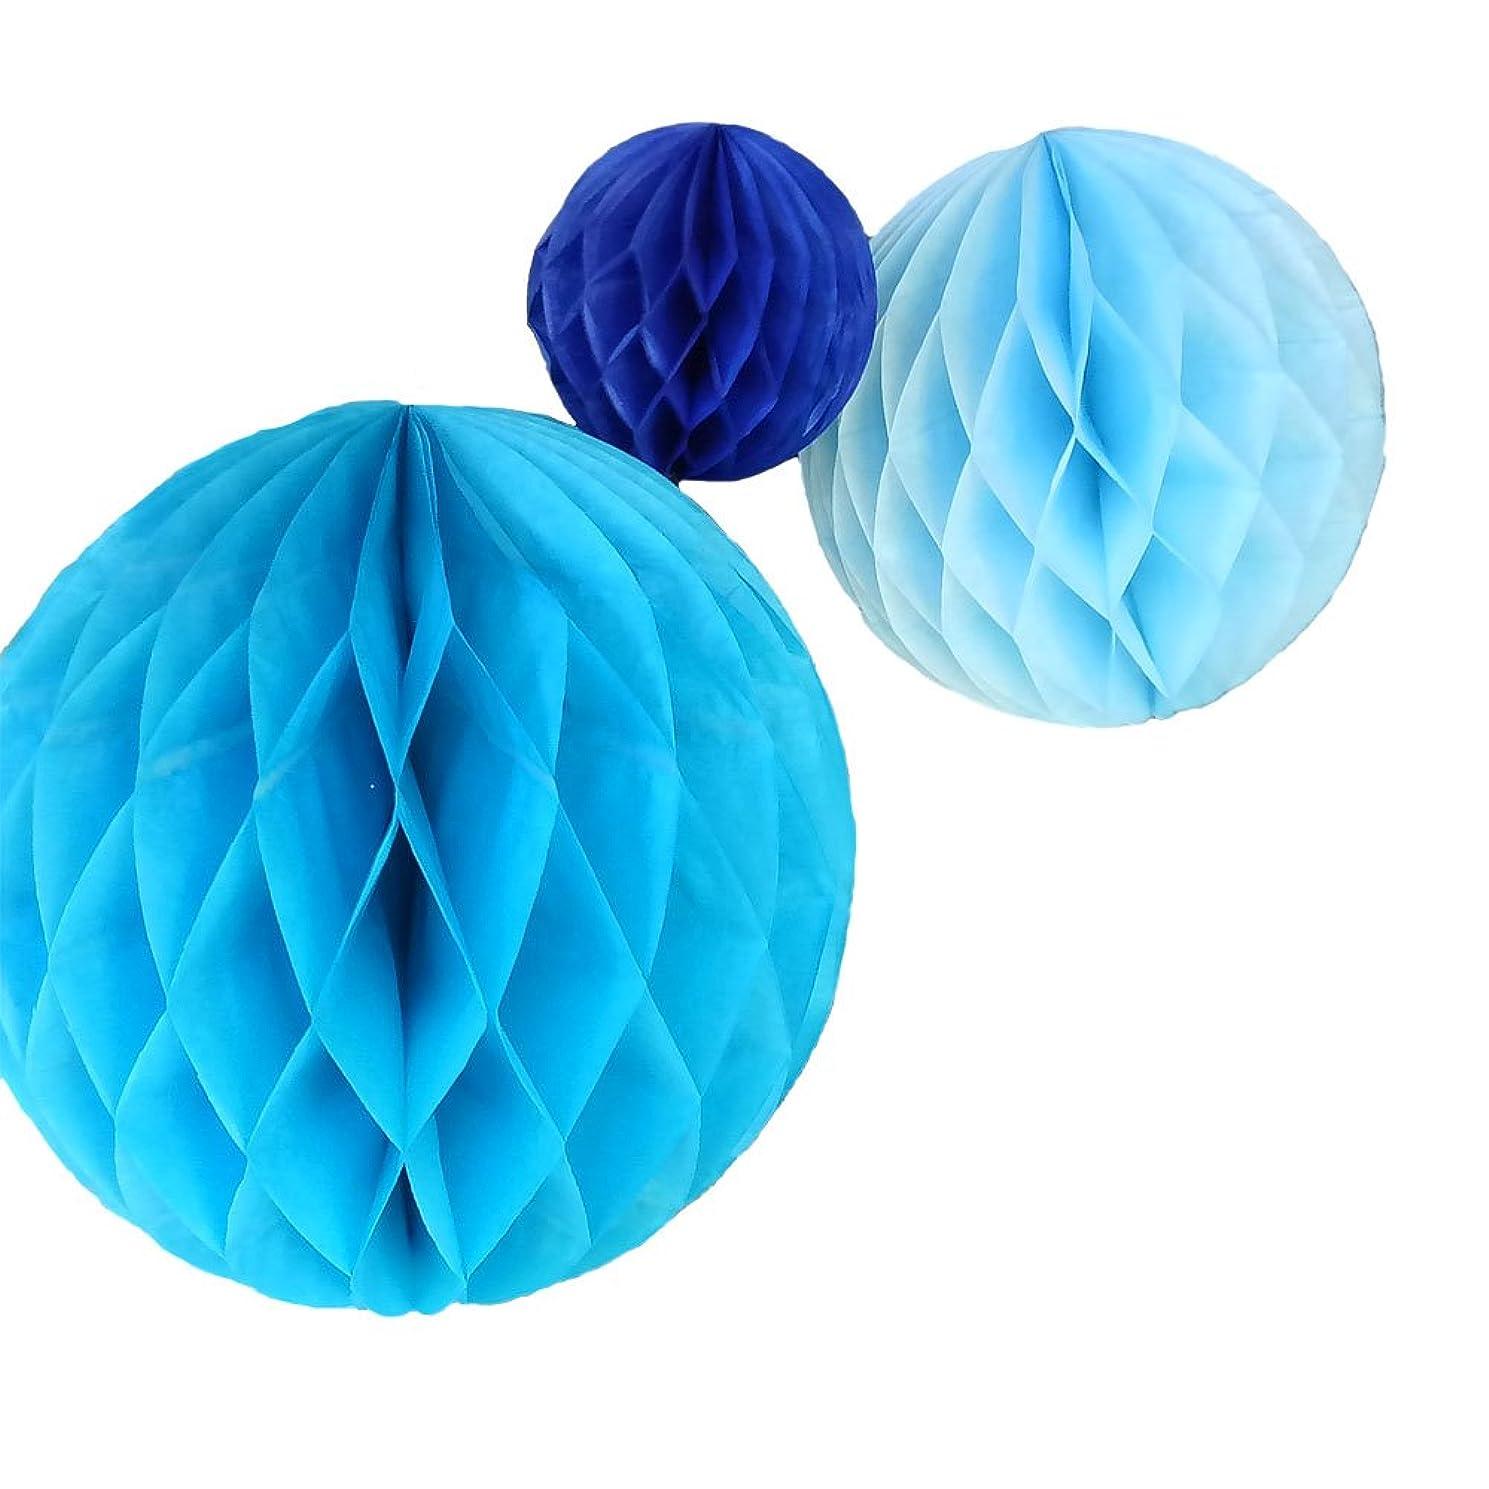 Daily Mall 15Pcs 3 inch 6 inch 8 inch Paper Honeycomb Balls Party Pom Poms Paper Balls Partners Design Art Craft Hanging Pom-Pom Ball Party Wedding Birthday Nursery Decor (Blue Set)